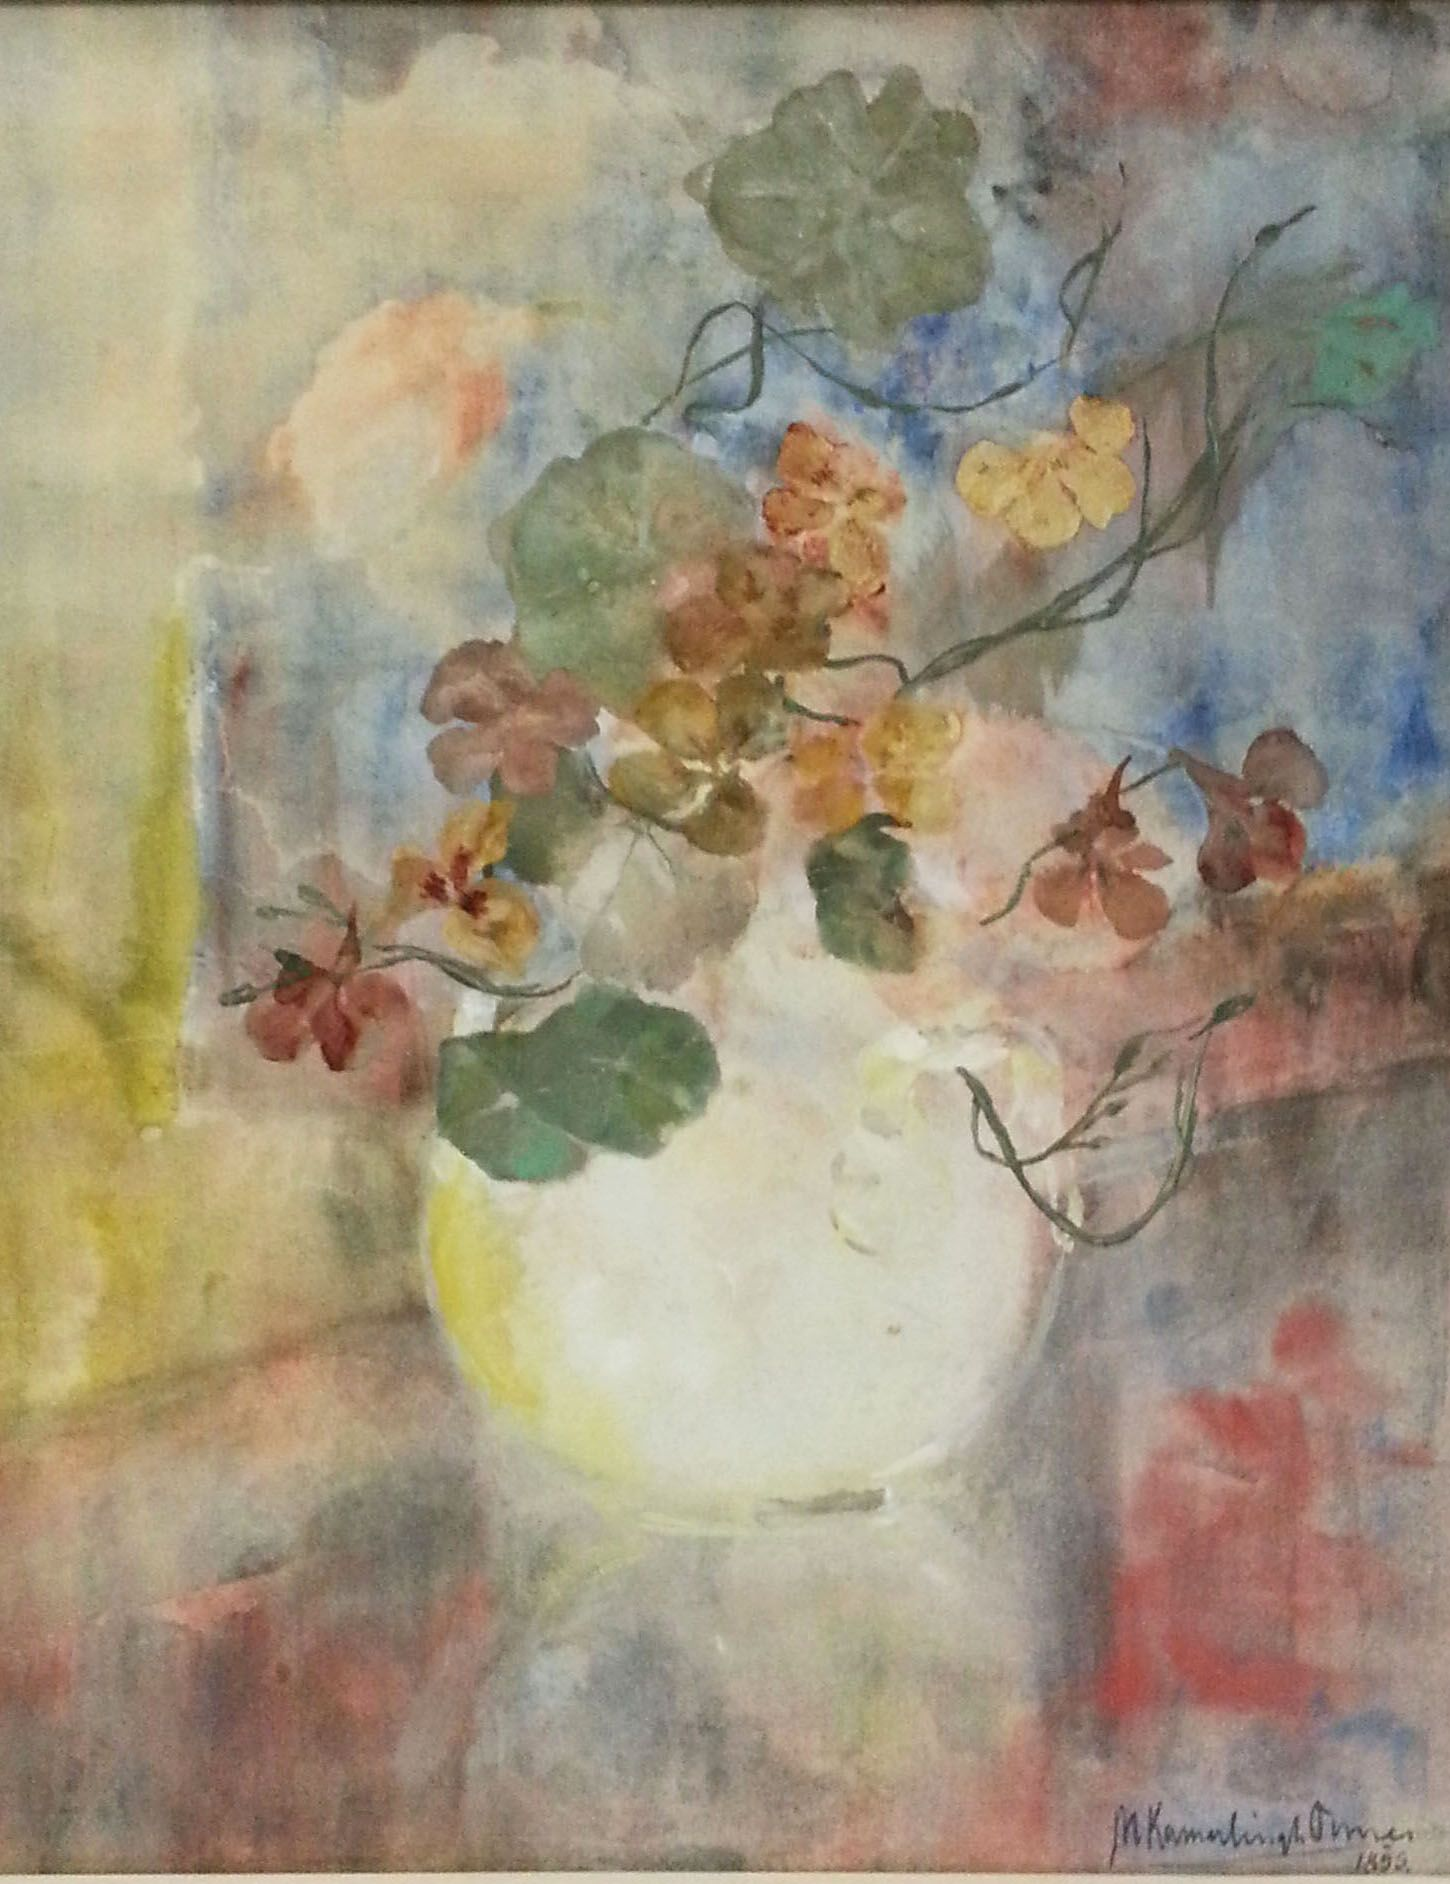 Vaasjes met akelei, blaassilenes en blauwe schijnpapaver | Hein A.M. Klaver Kunsthandel